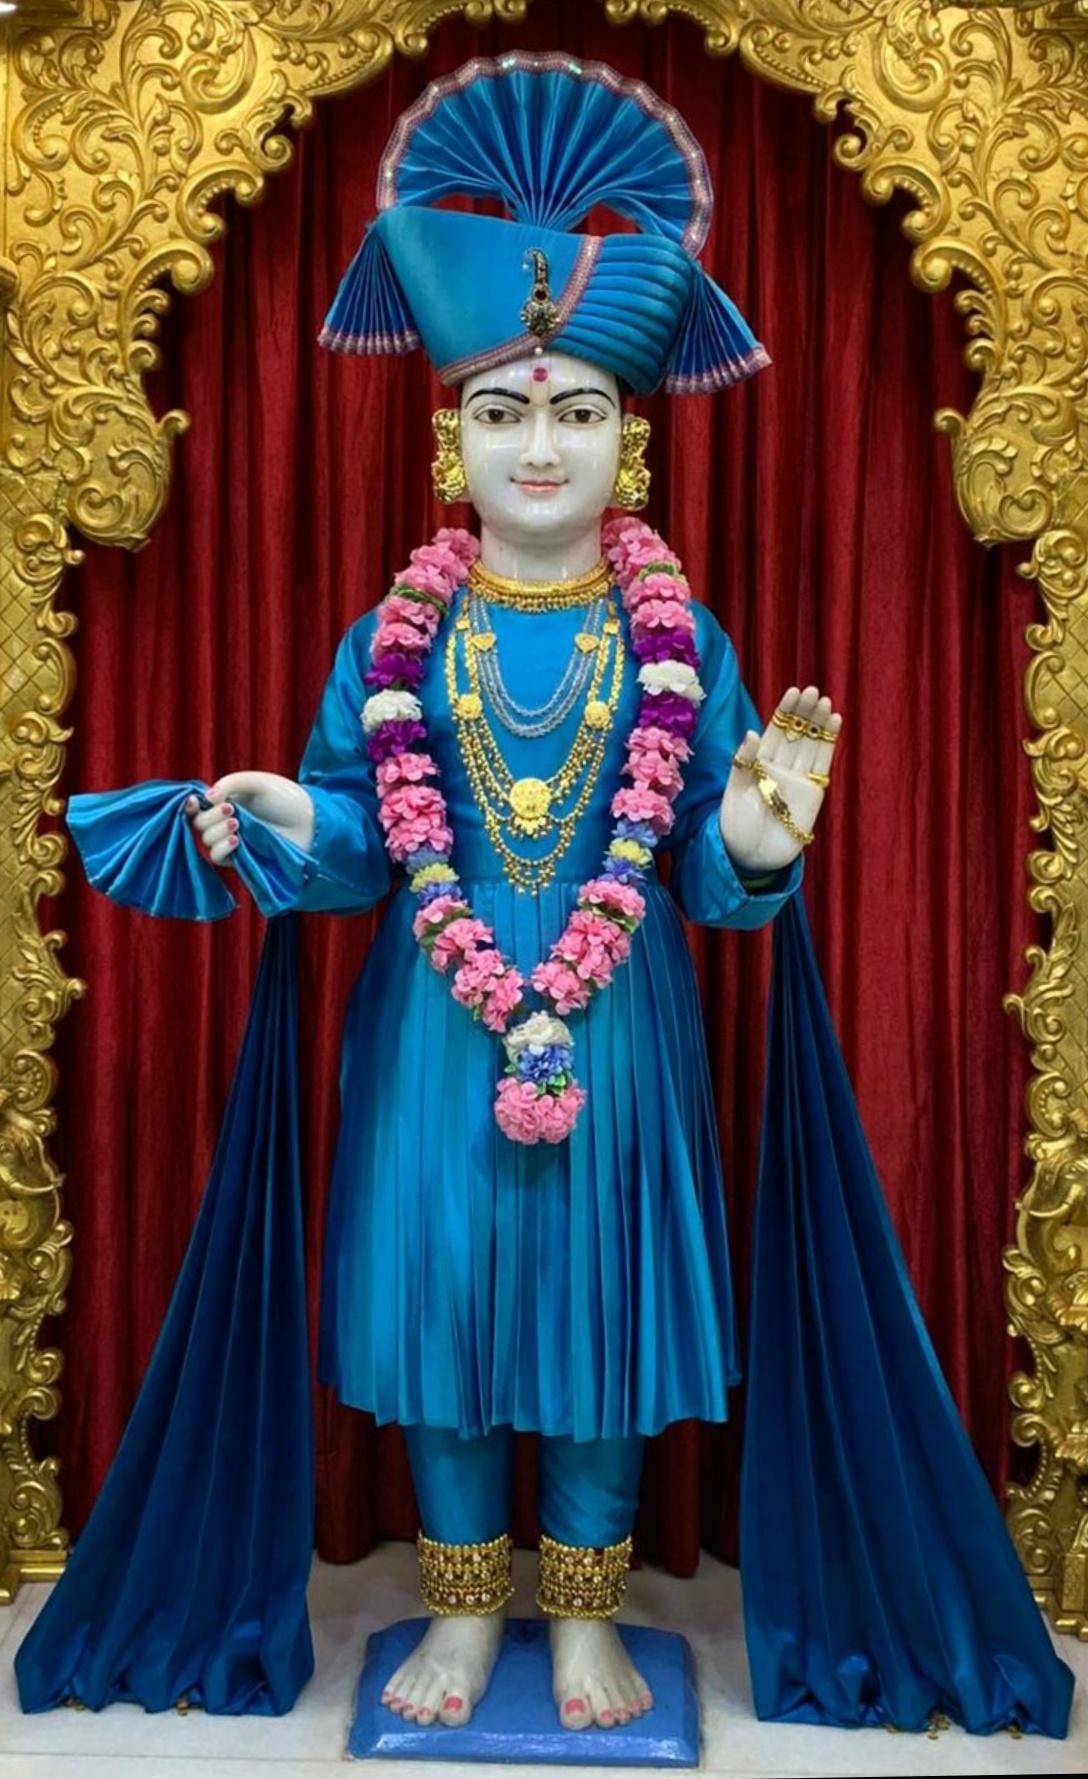 SMVS Swaminarayan Mandir - Vasna